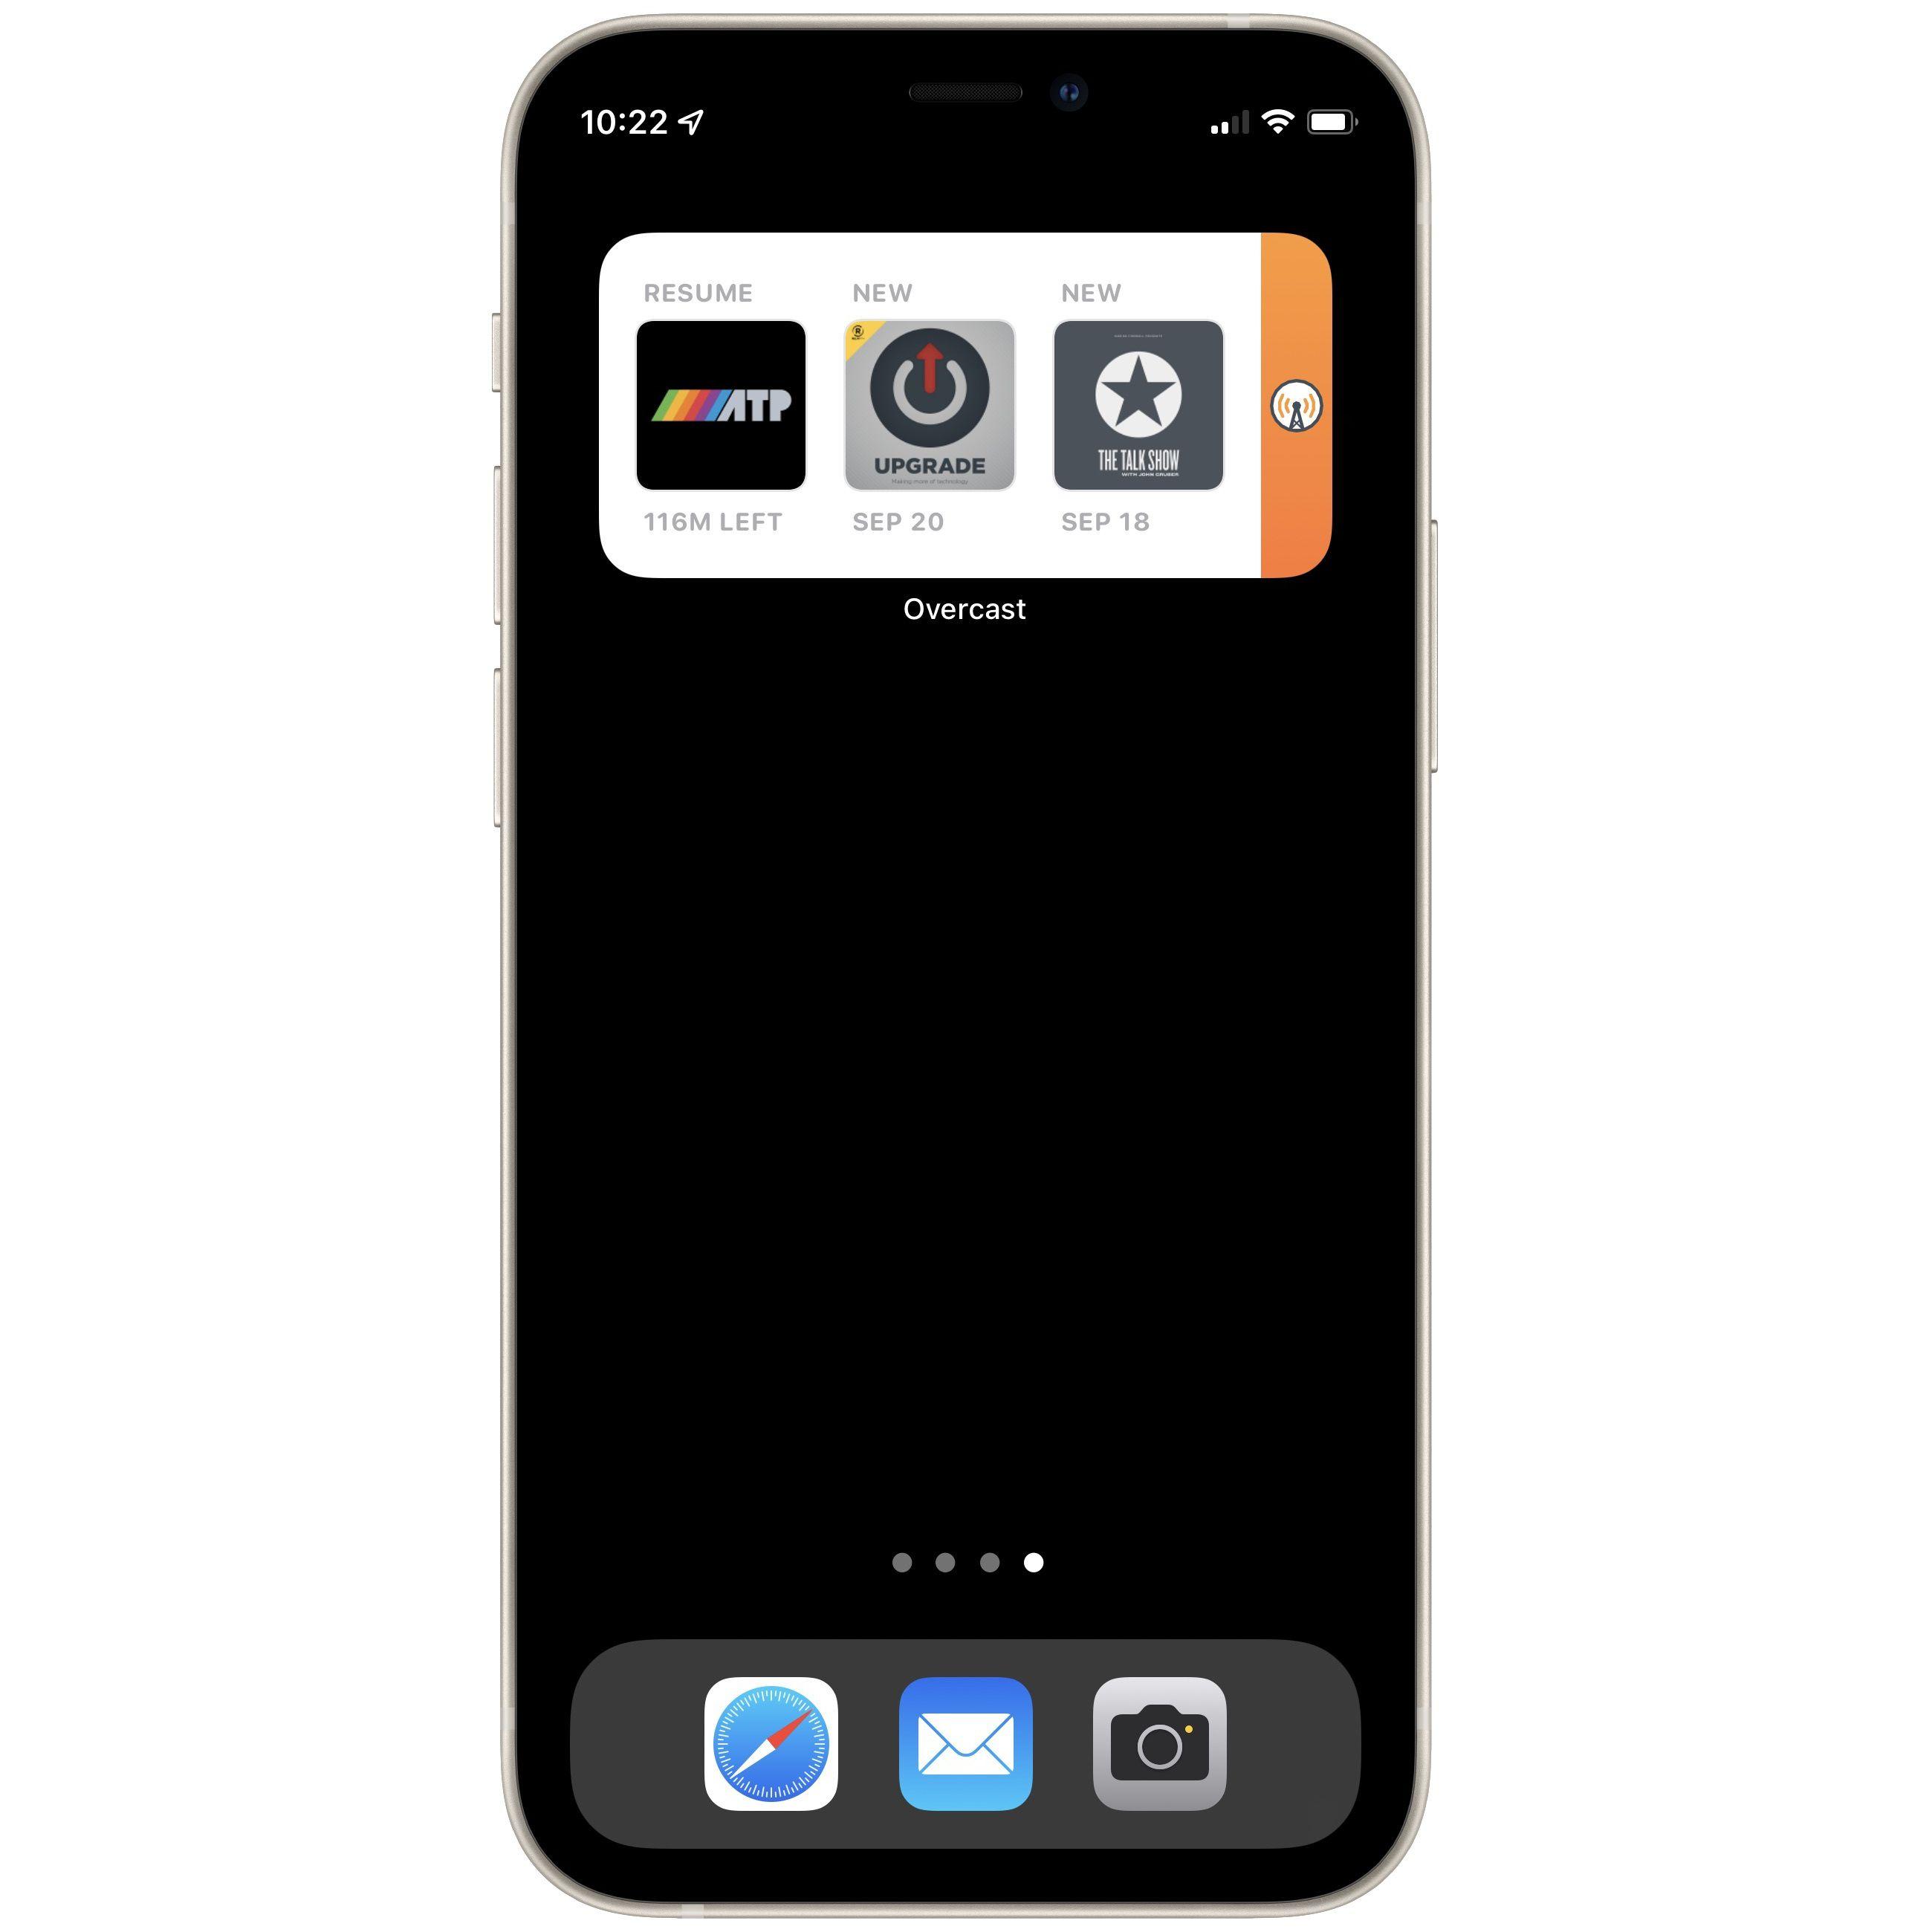 Overcast app widget on iPhone